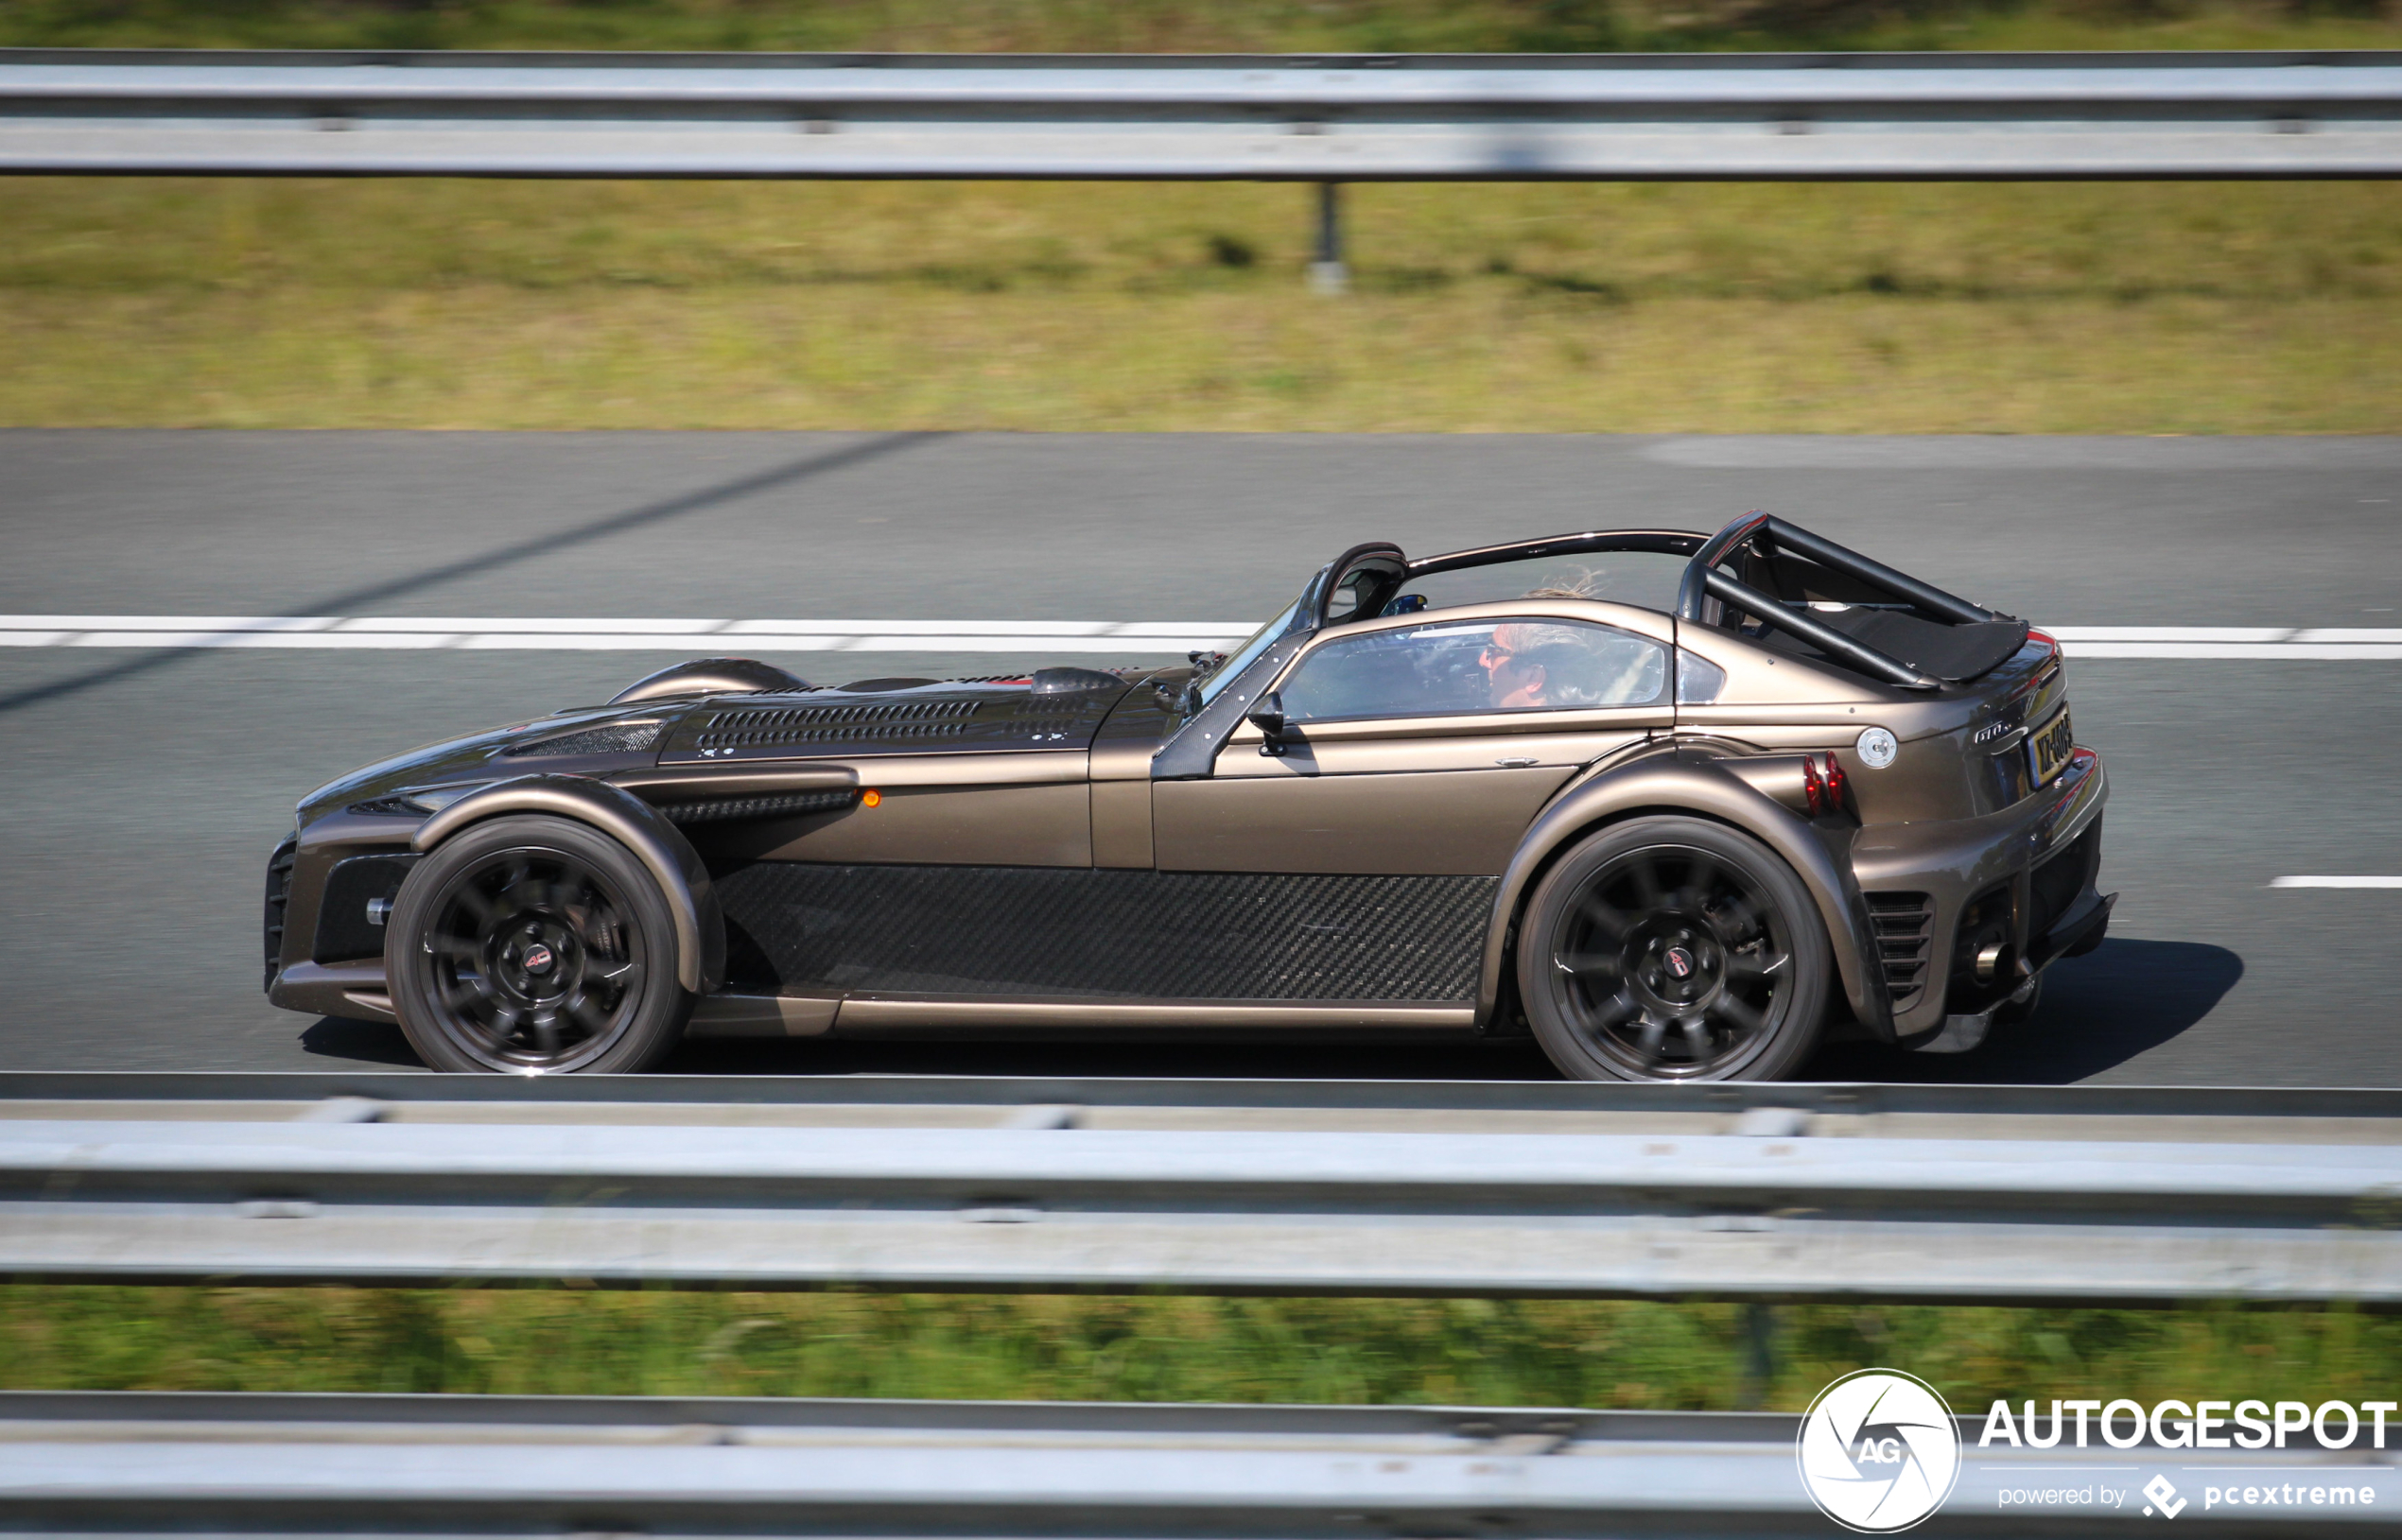 Donkervoort D8 GTO-40 - 23 April 2020 - Autogespot